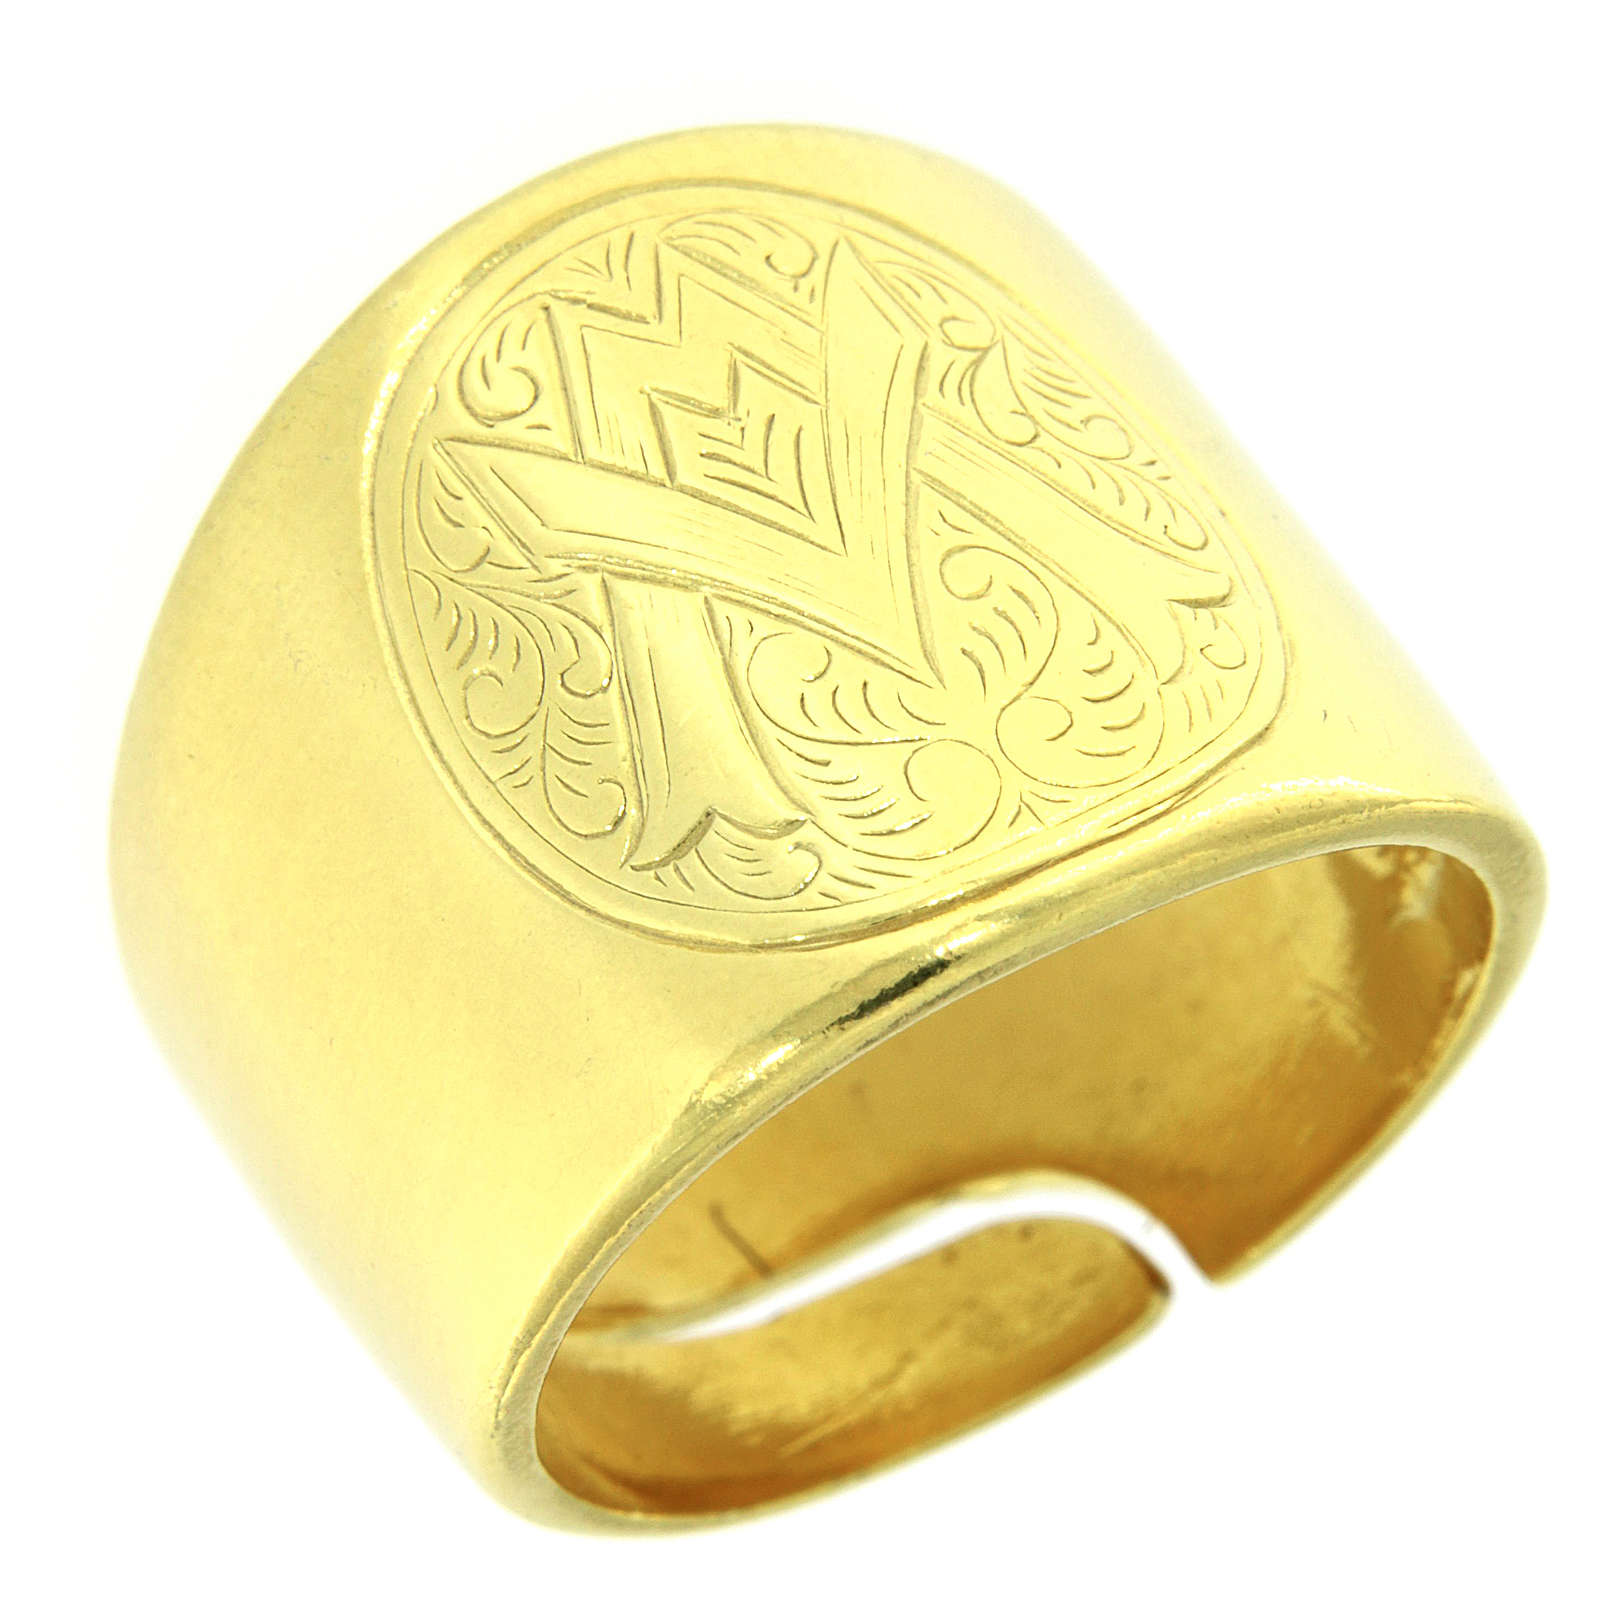 Anello simbolo Ave Maria Argento 925 3